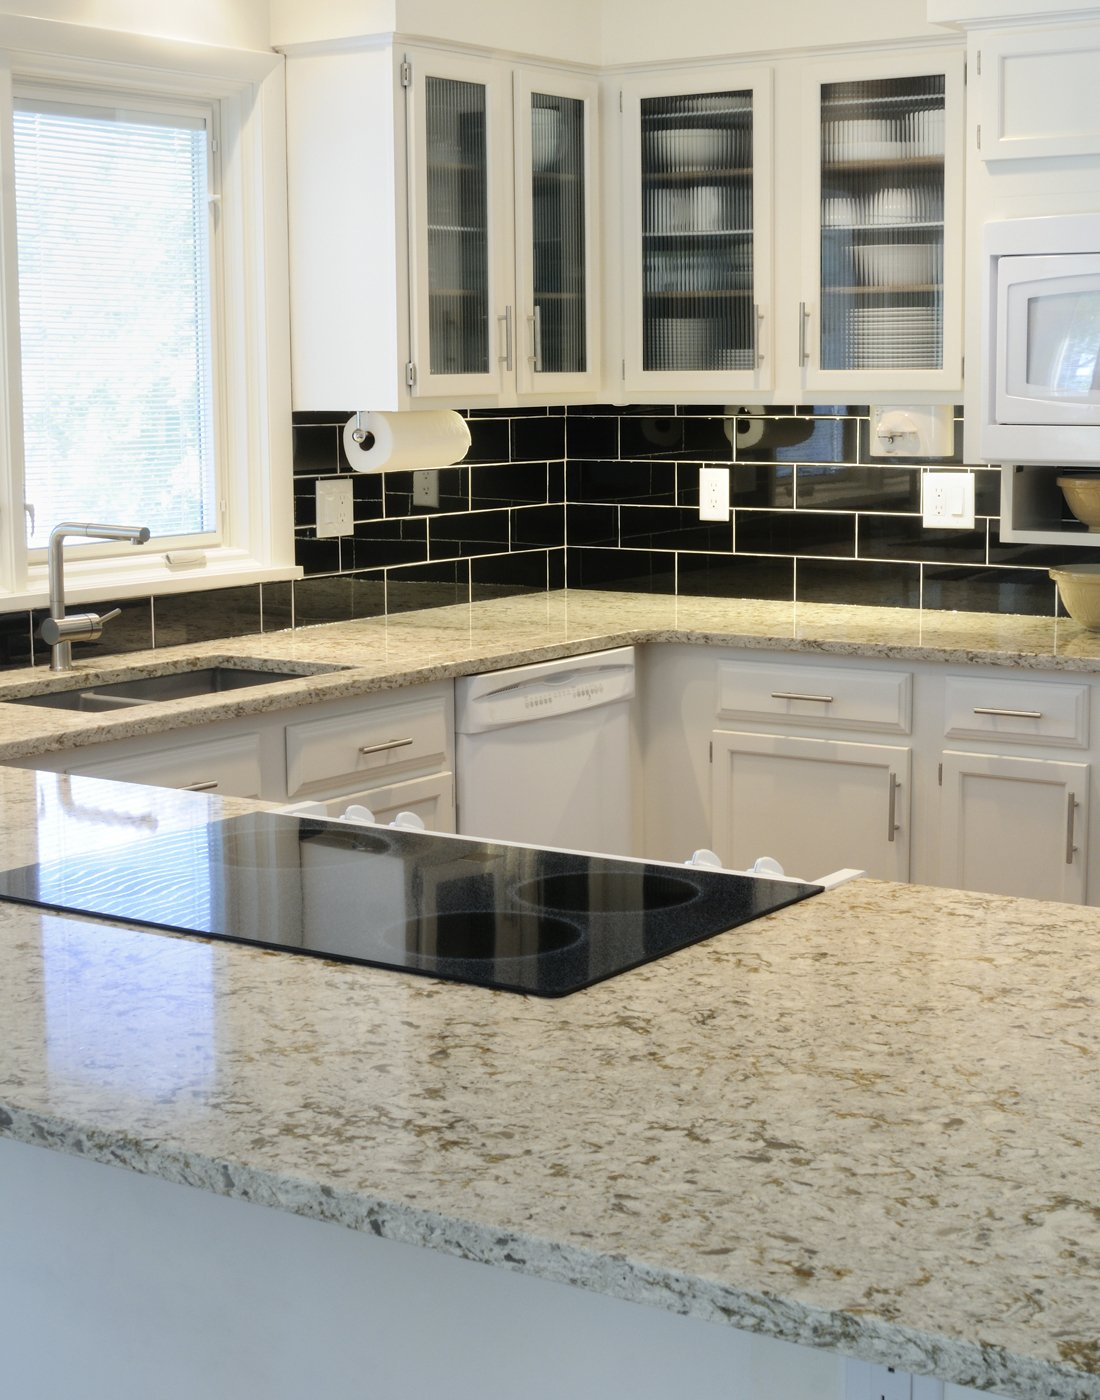 Eckert Renovations FAQ